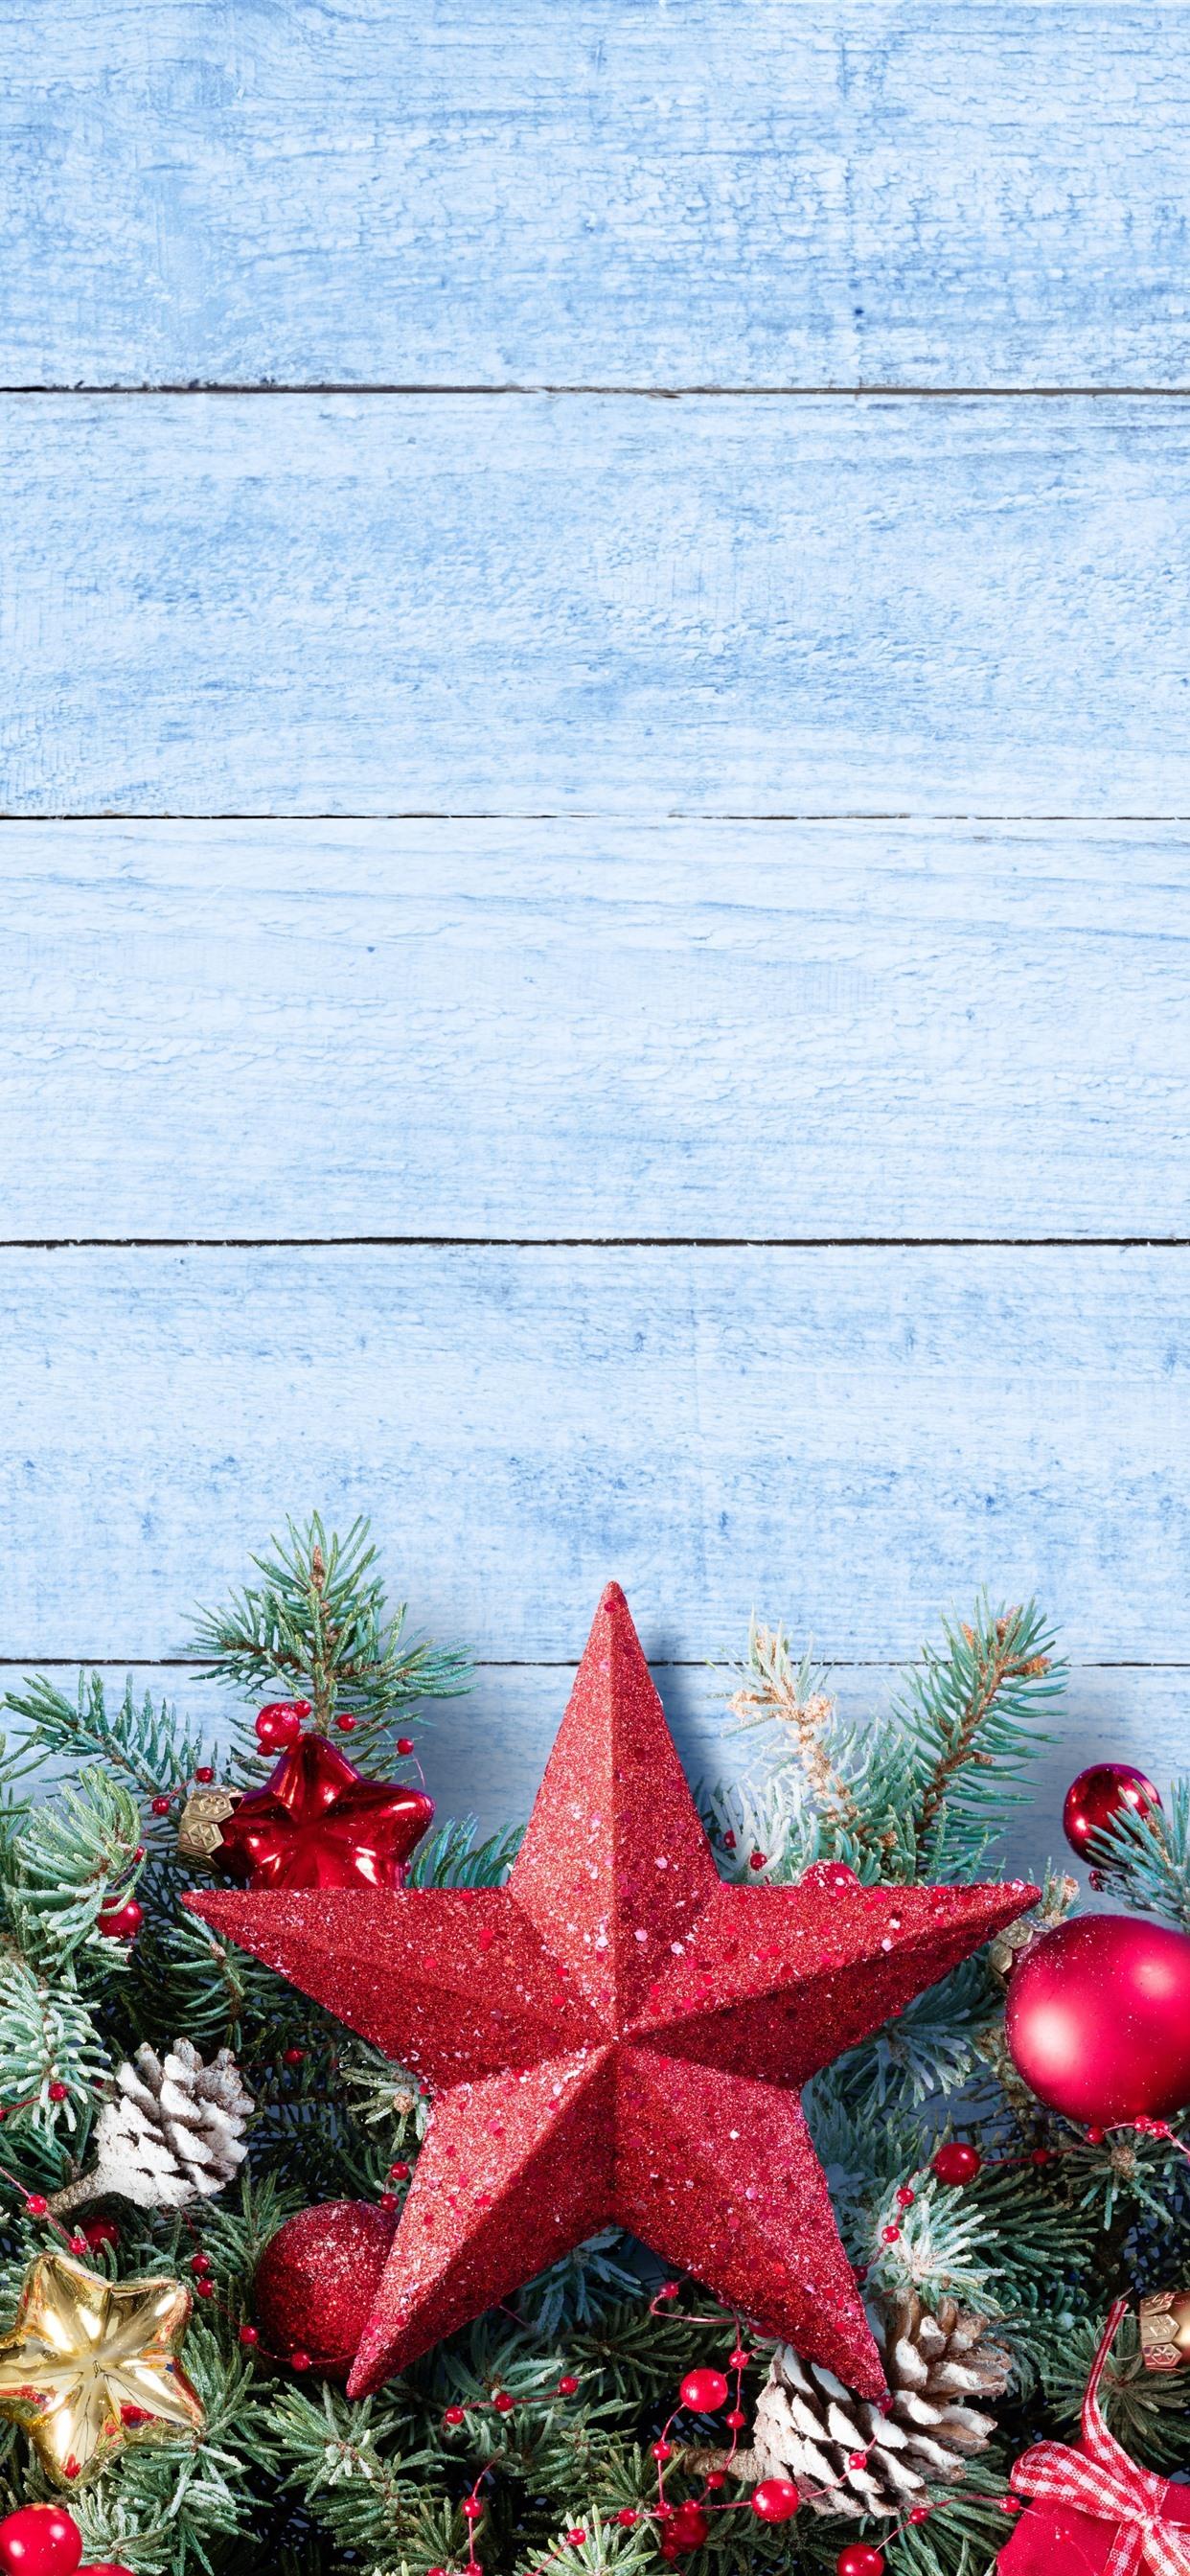 Merry Christmas Wallpaper.Merry Christmas Stars Balls Decoration 1242x2688 Iphone